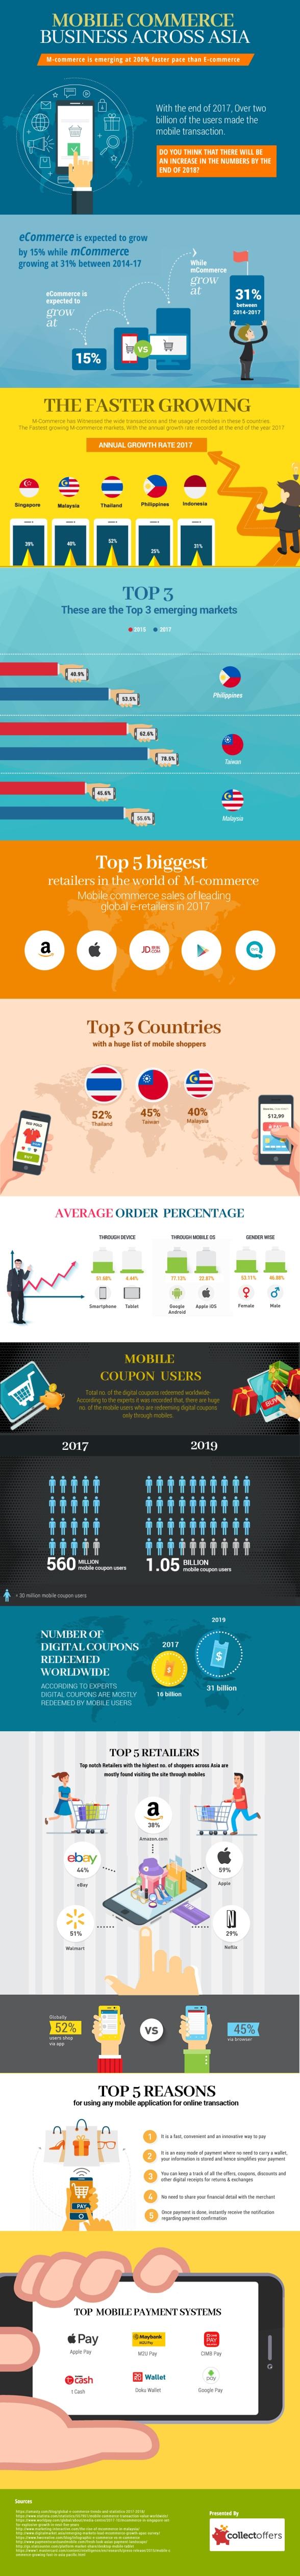 M-Commerce Business